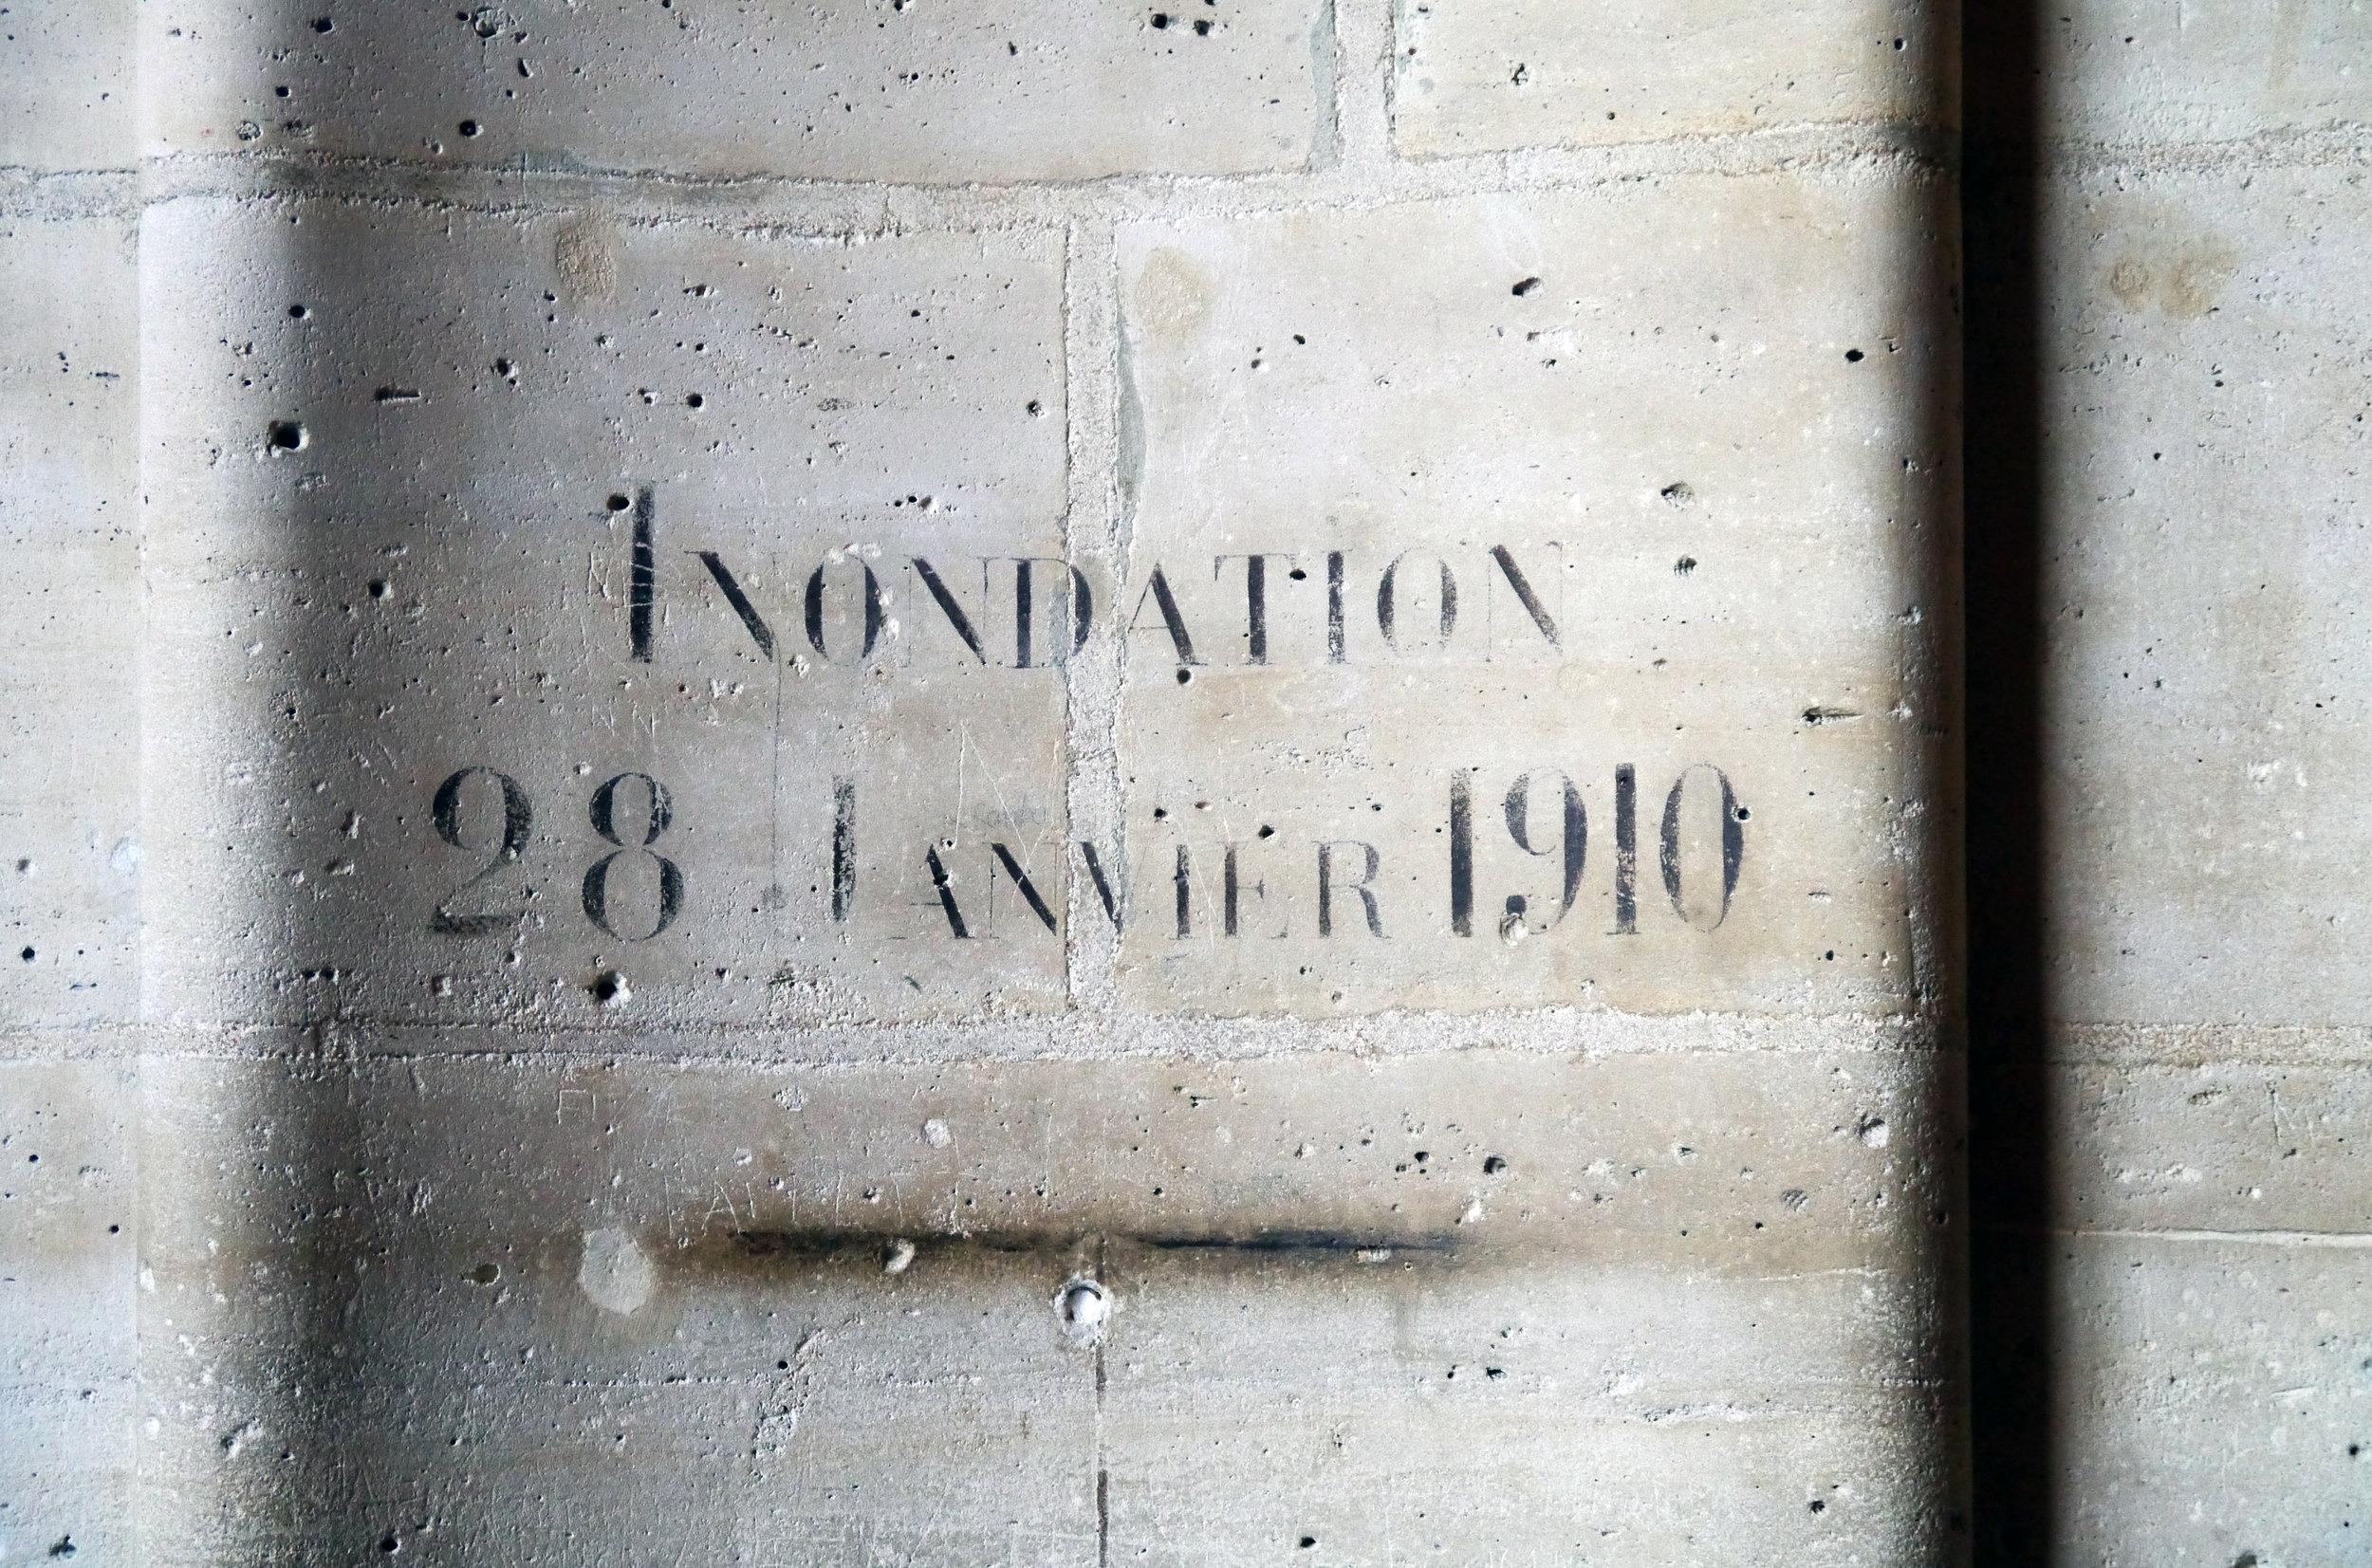 1910_Flood_Level_Sign_in_Salle_des_Gardes,_Conciergerie,_Paris..JPG